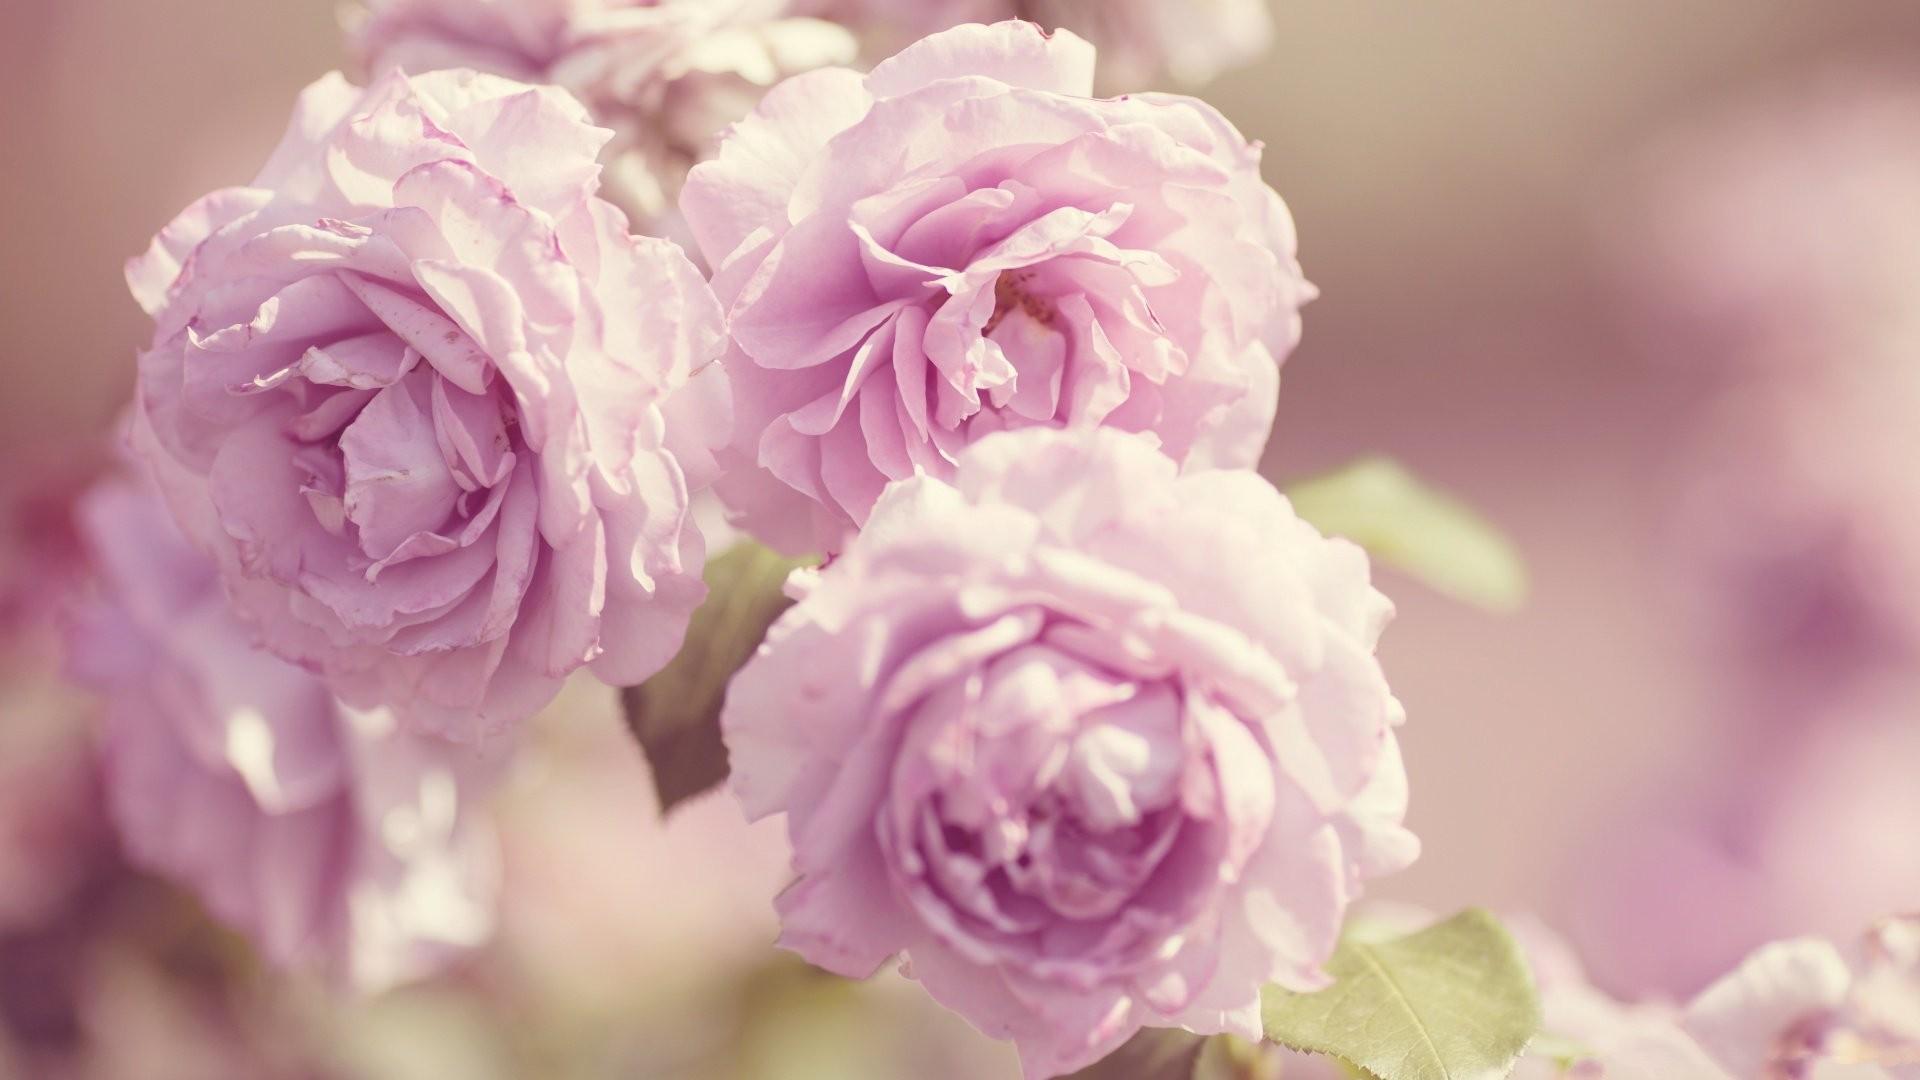 Hintergrundbilder Landschaft Pinke Blumen Lila Blühen Frühling